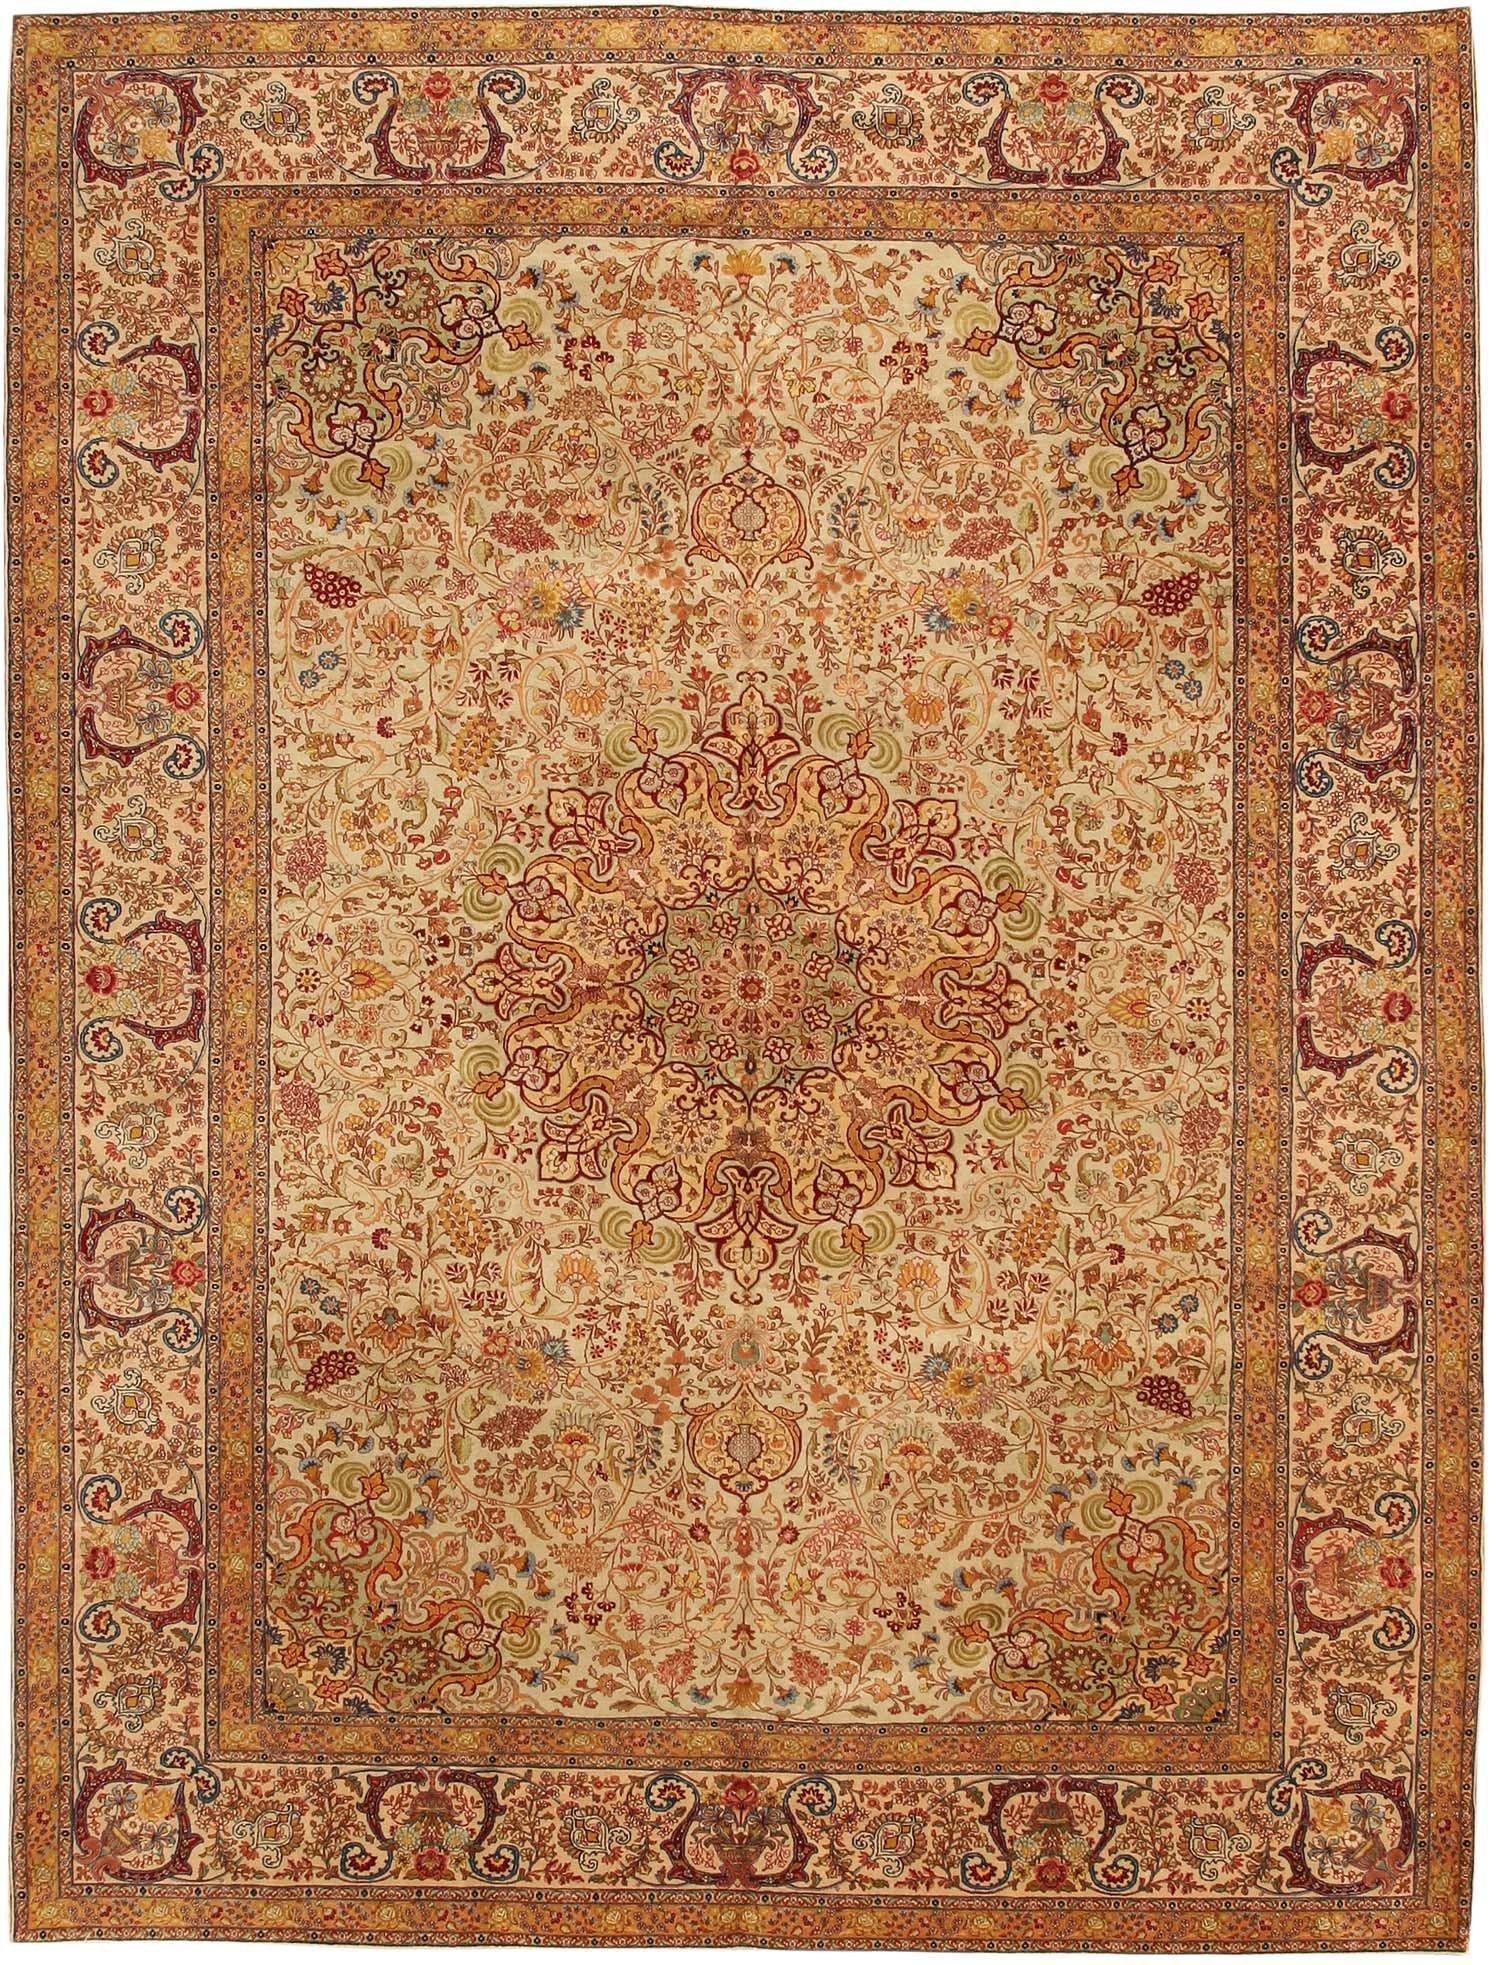 Antique Tabriz Persian Rug 7993 Detail/Large View   By Nazmiyal